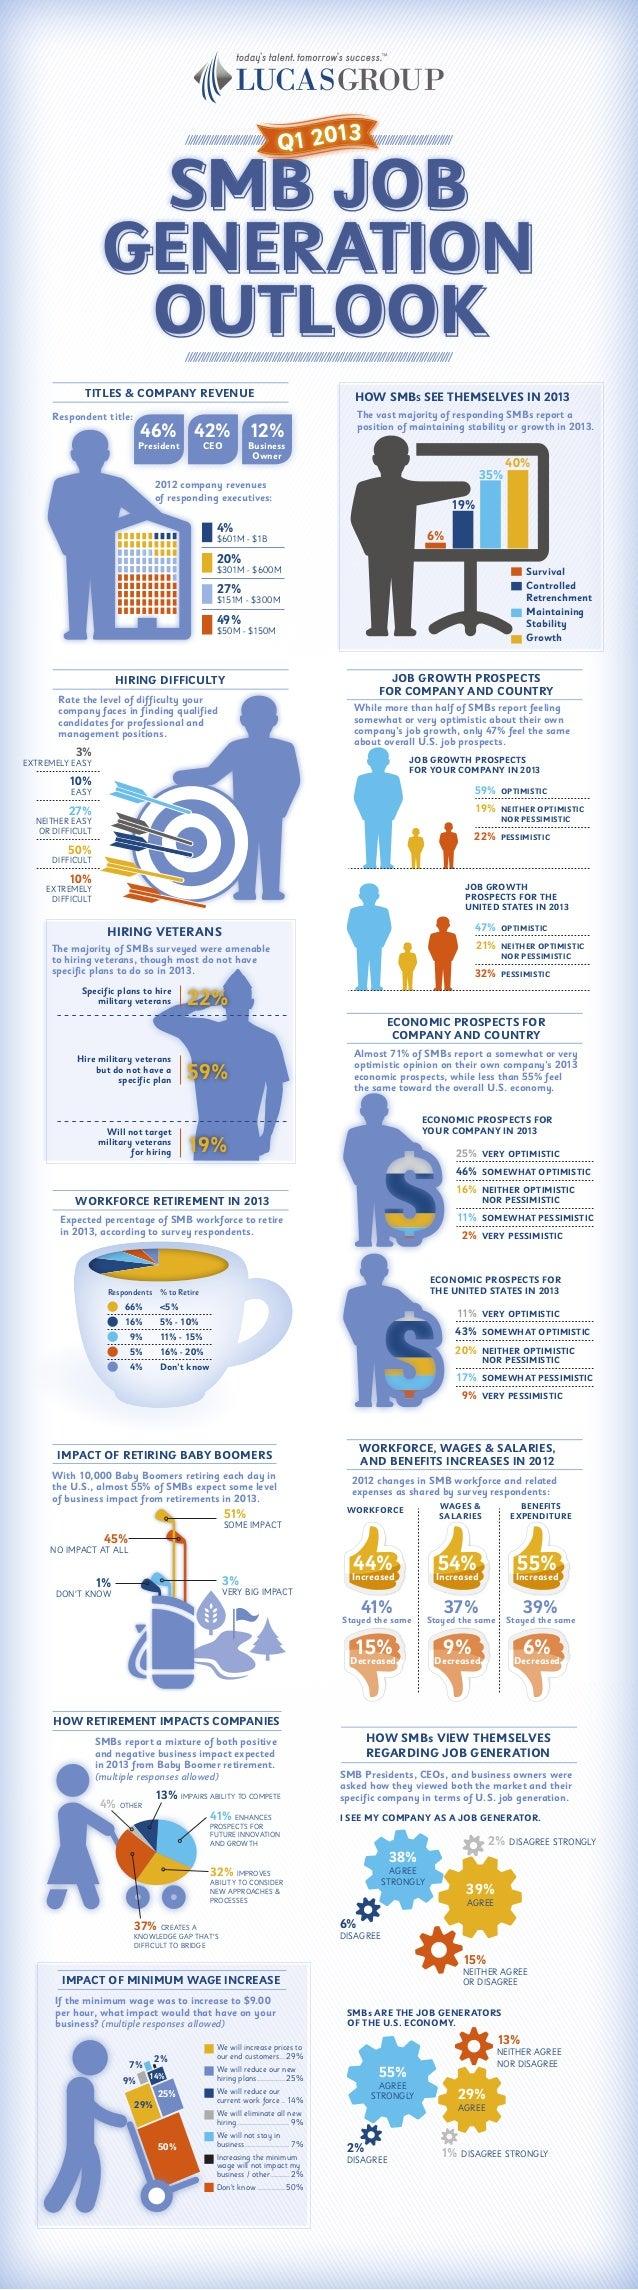 SMB JOB GENERATION OUTLOOK Q1 2013 TITLES & COMPANY REVENUE Respondent title: 49% $50M - $150M 27% $151M - $300M 20% $301M...